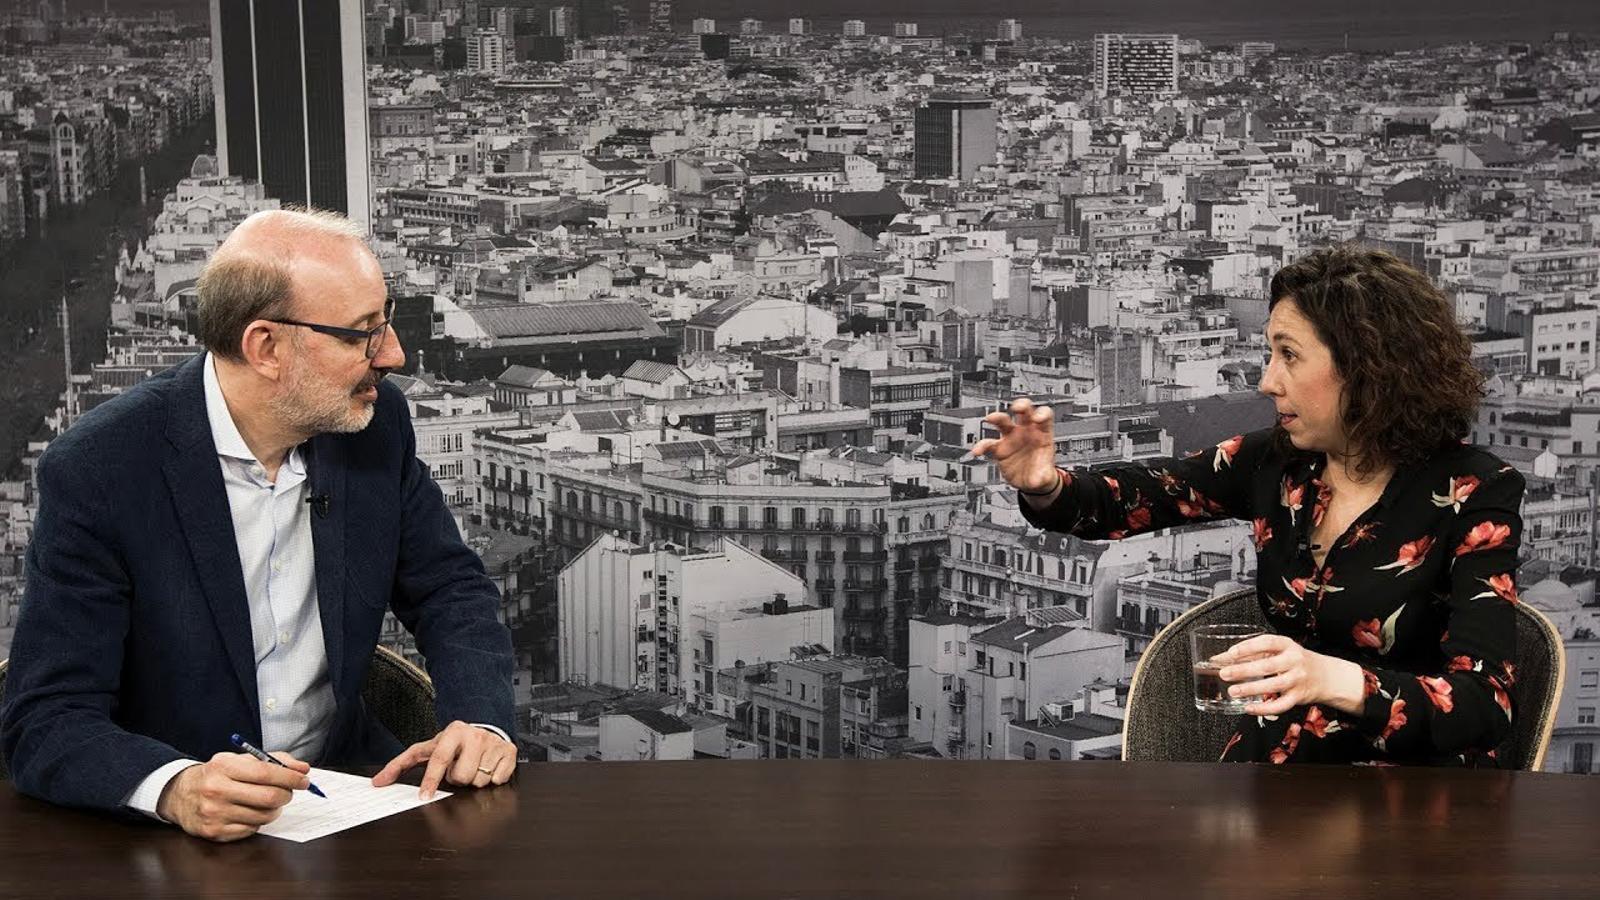 Entrevista d'Antoni Bassas a Judit Martín